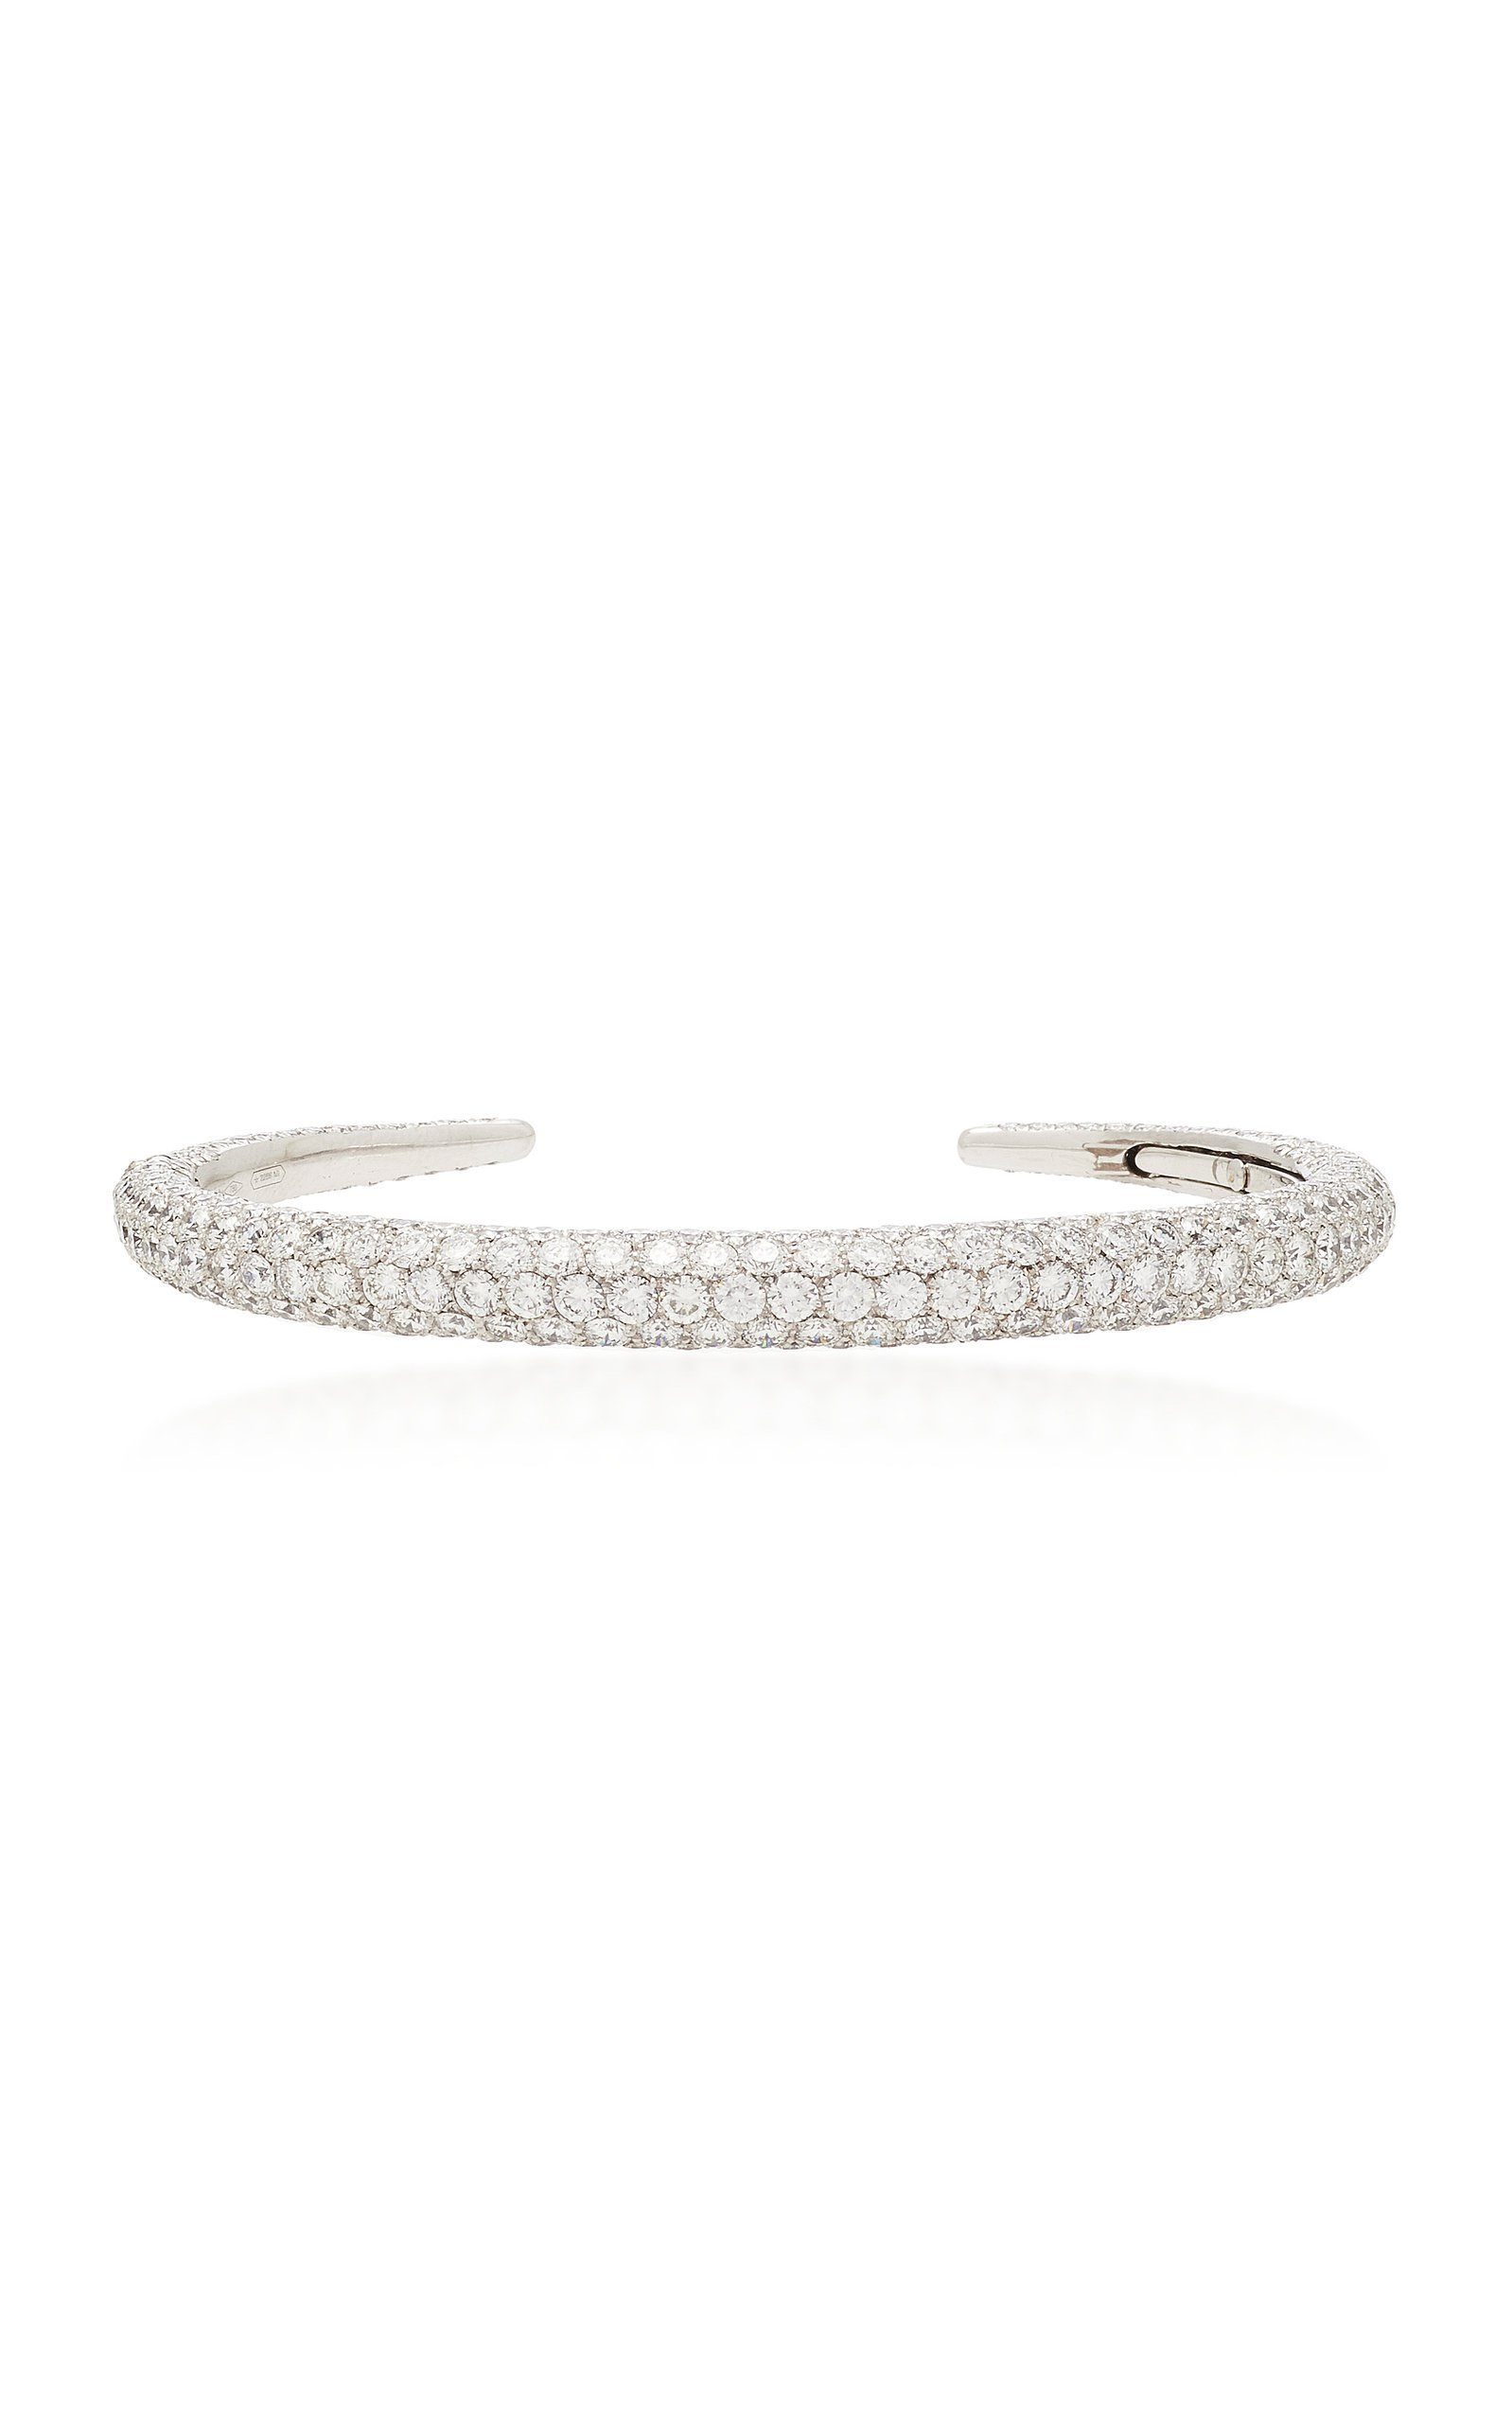 Busatti Piercing 18K White Gold And Diamond Bracelet